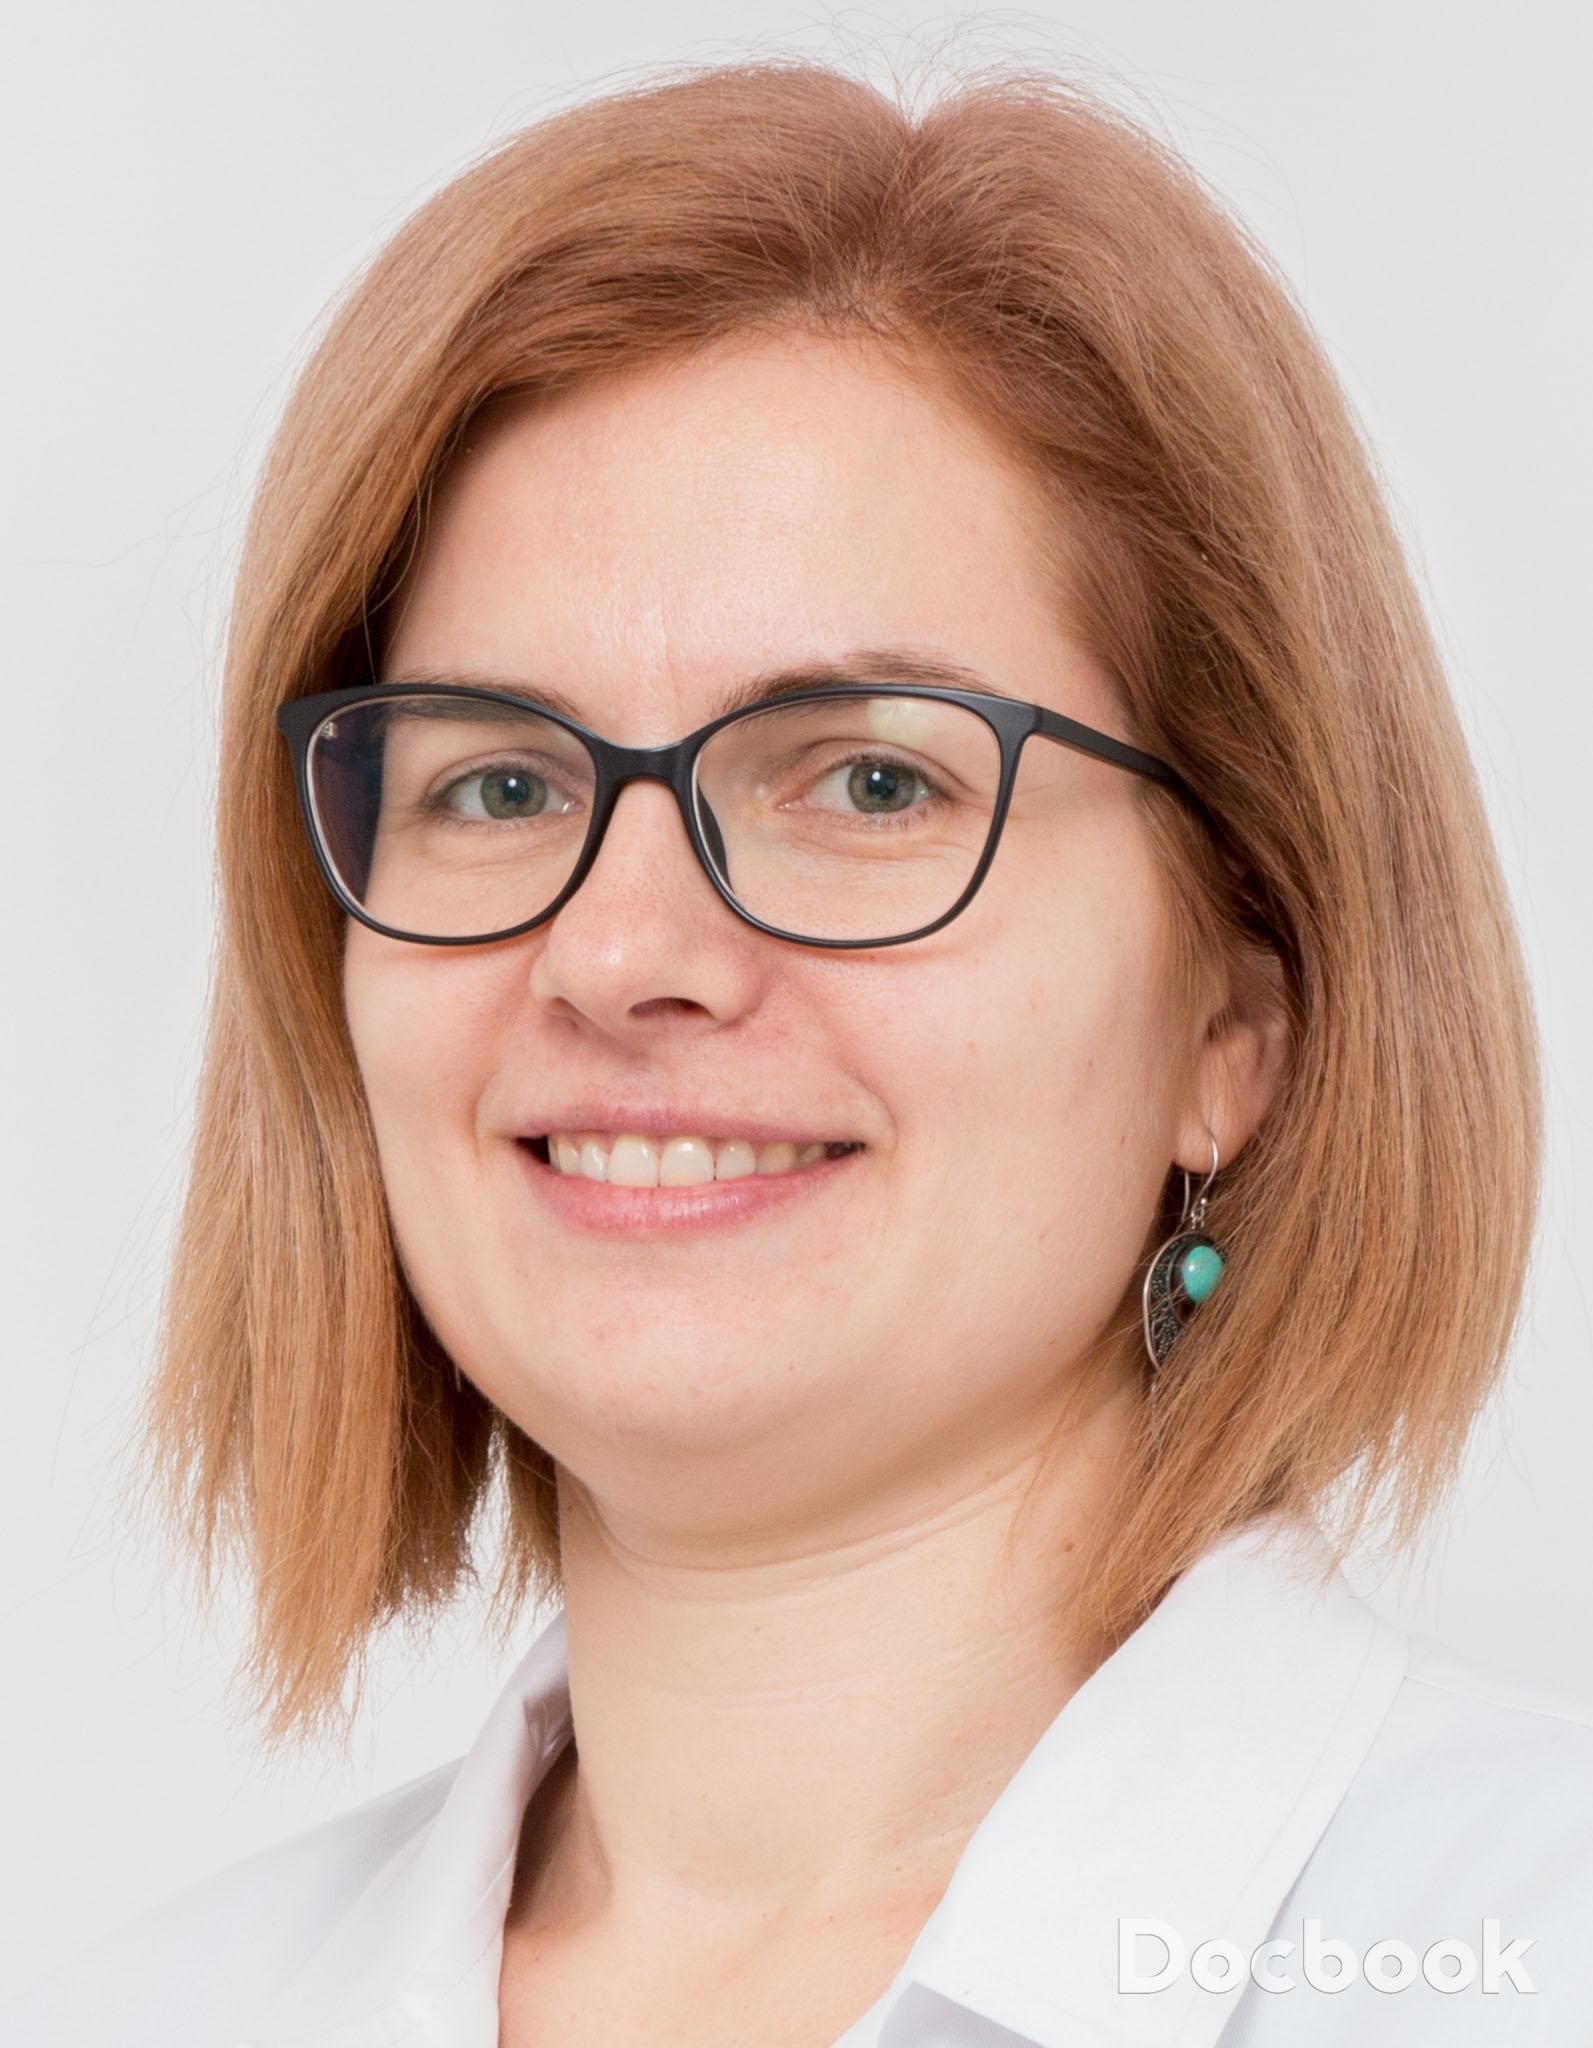 Dr. Minodora Suzana Craciun